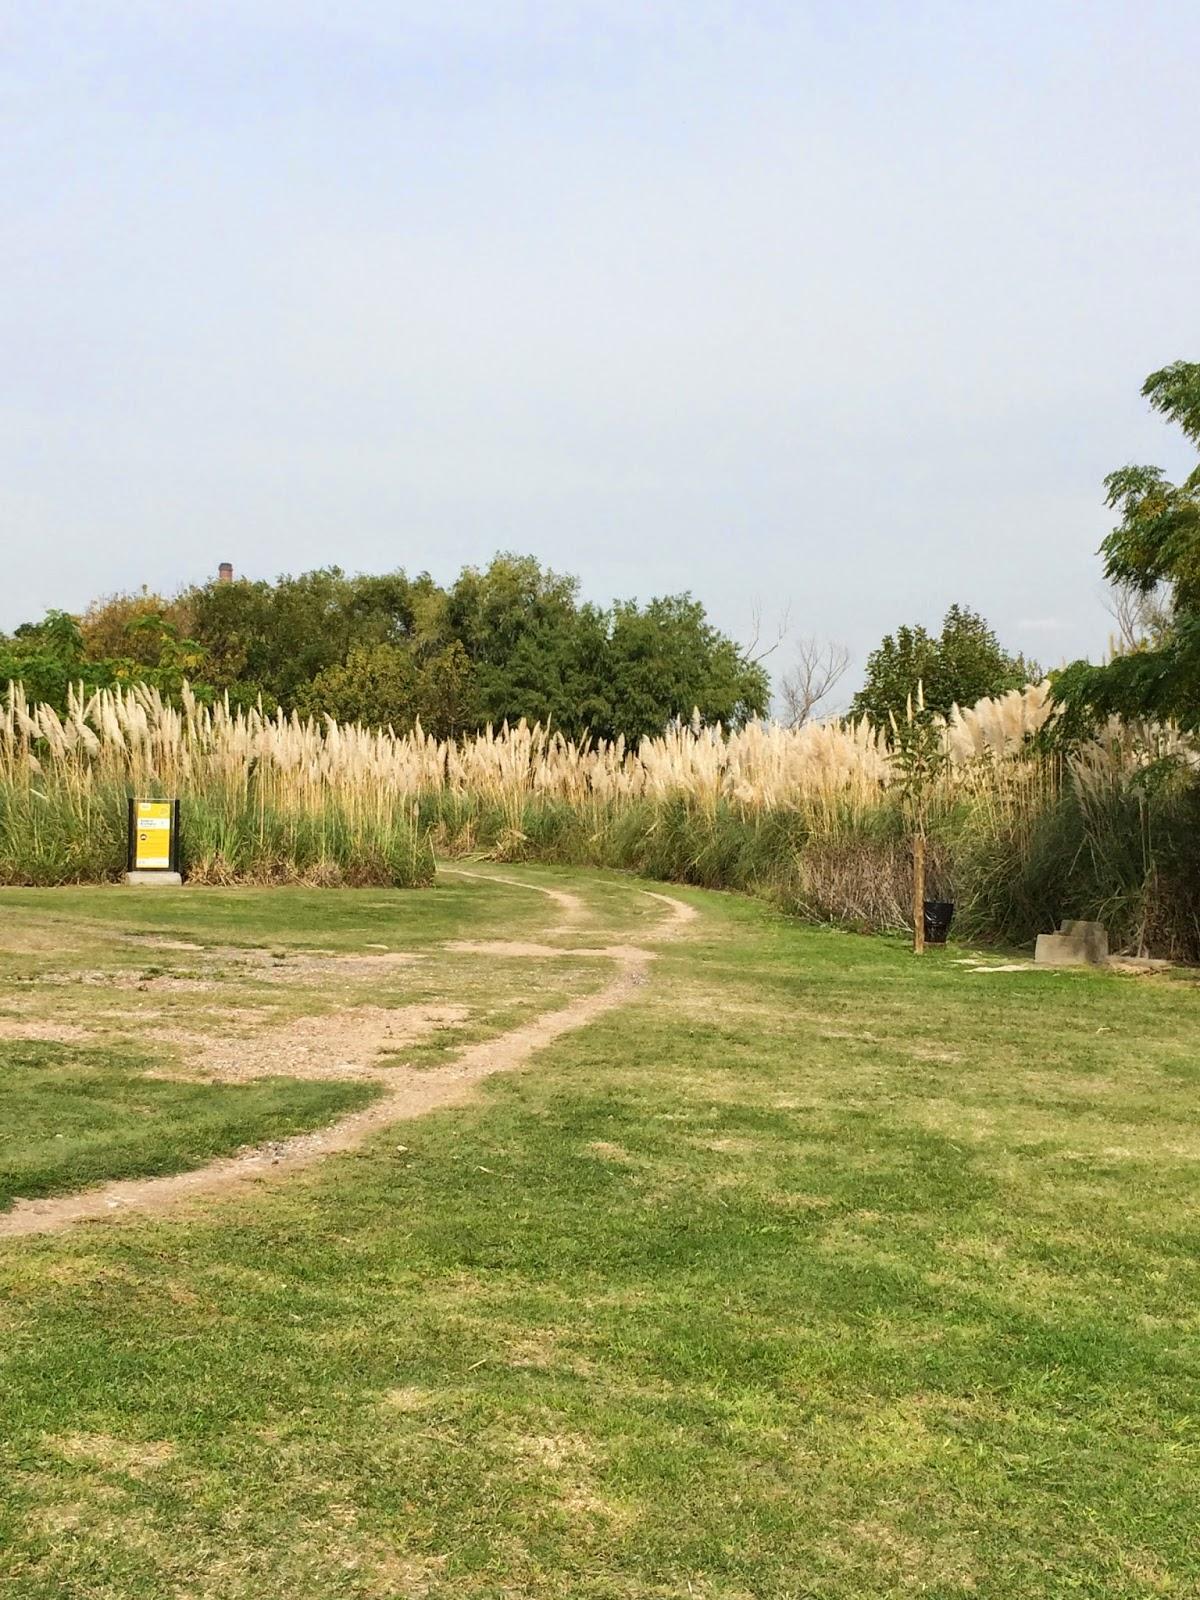 park_reserva_ecologica_argentina_5.jpg